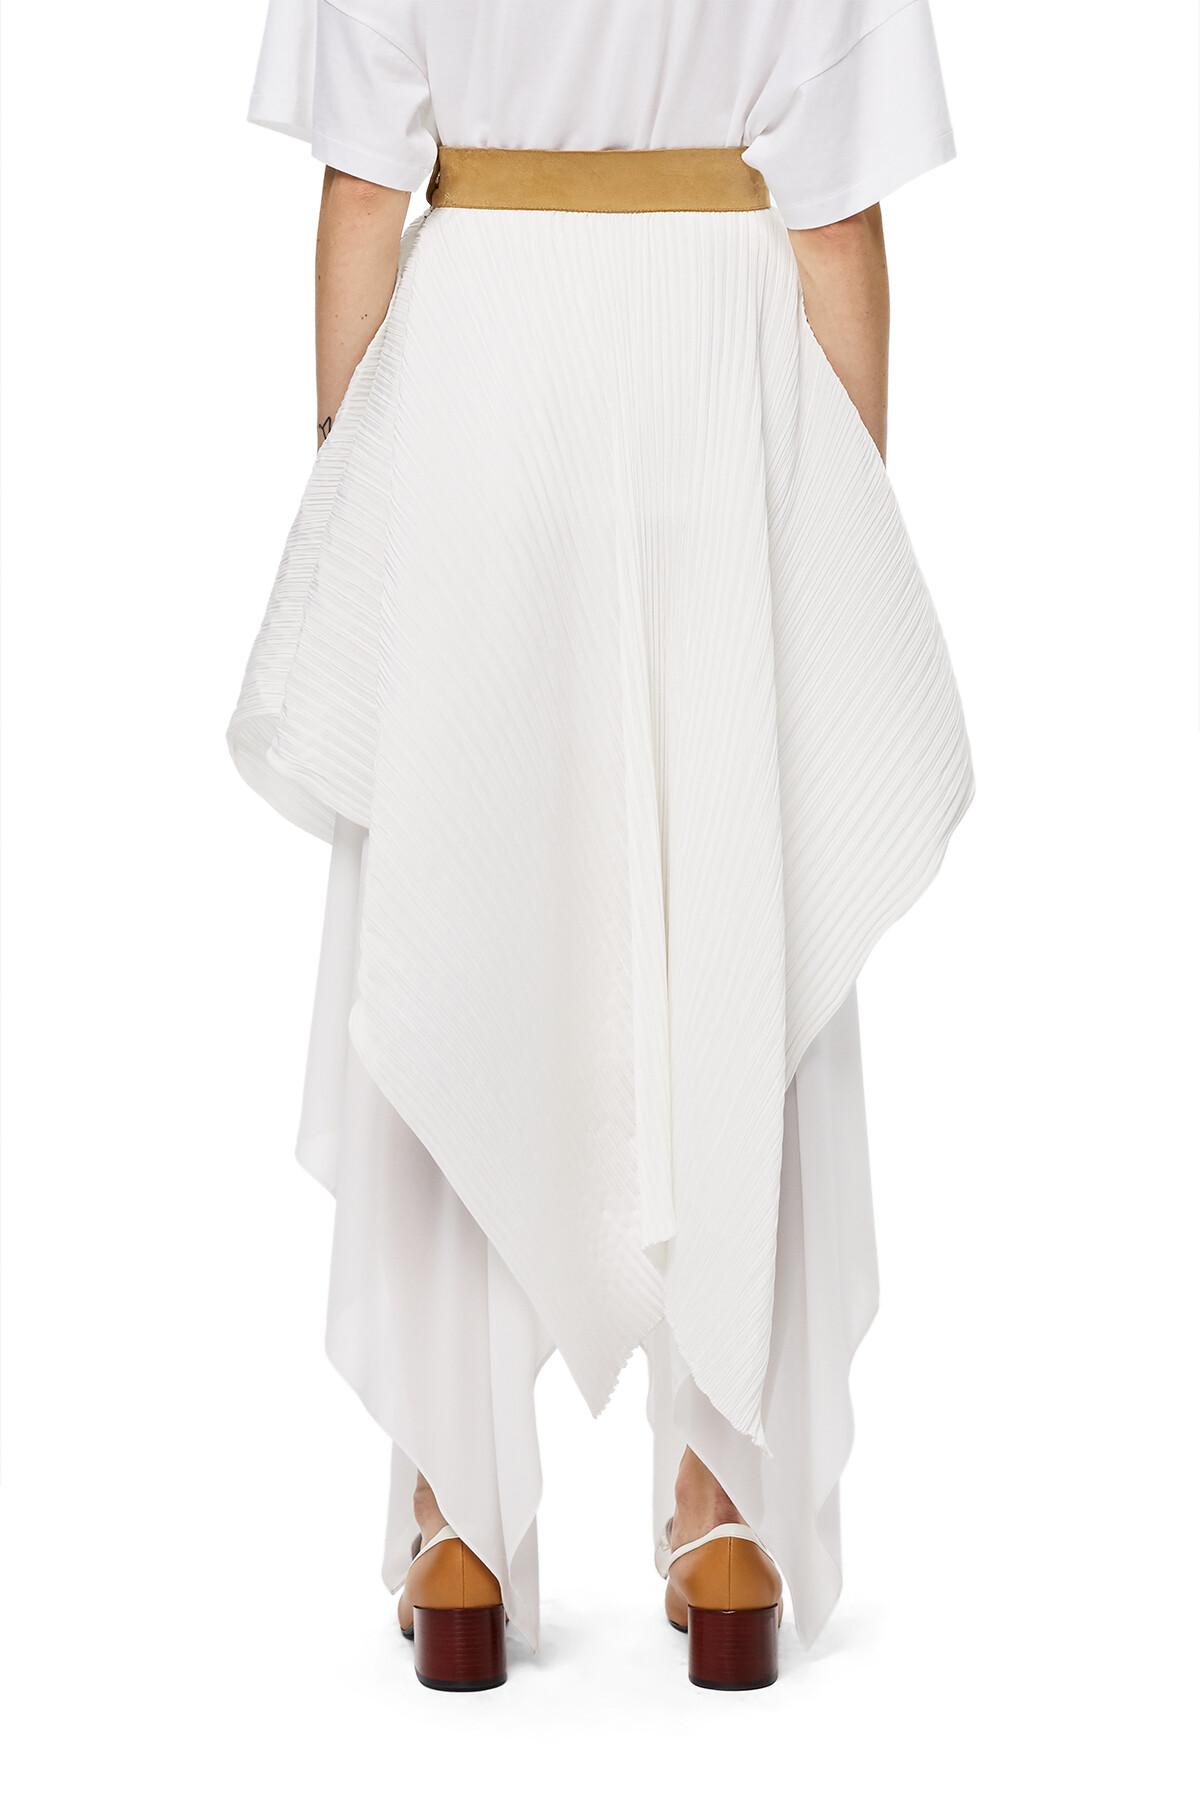 LOEWE Pleated Skirt White front